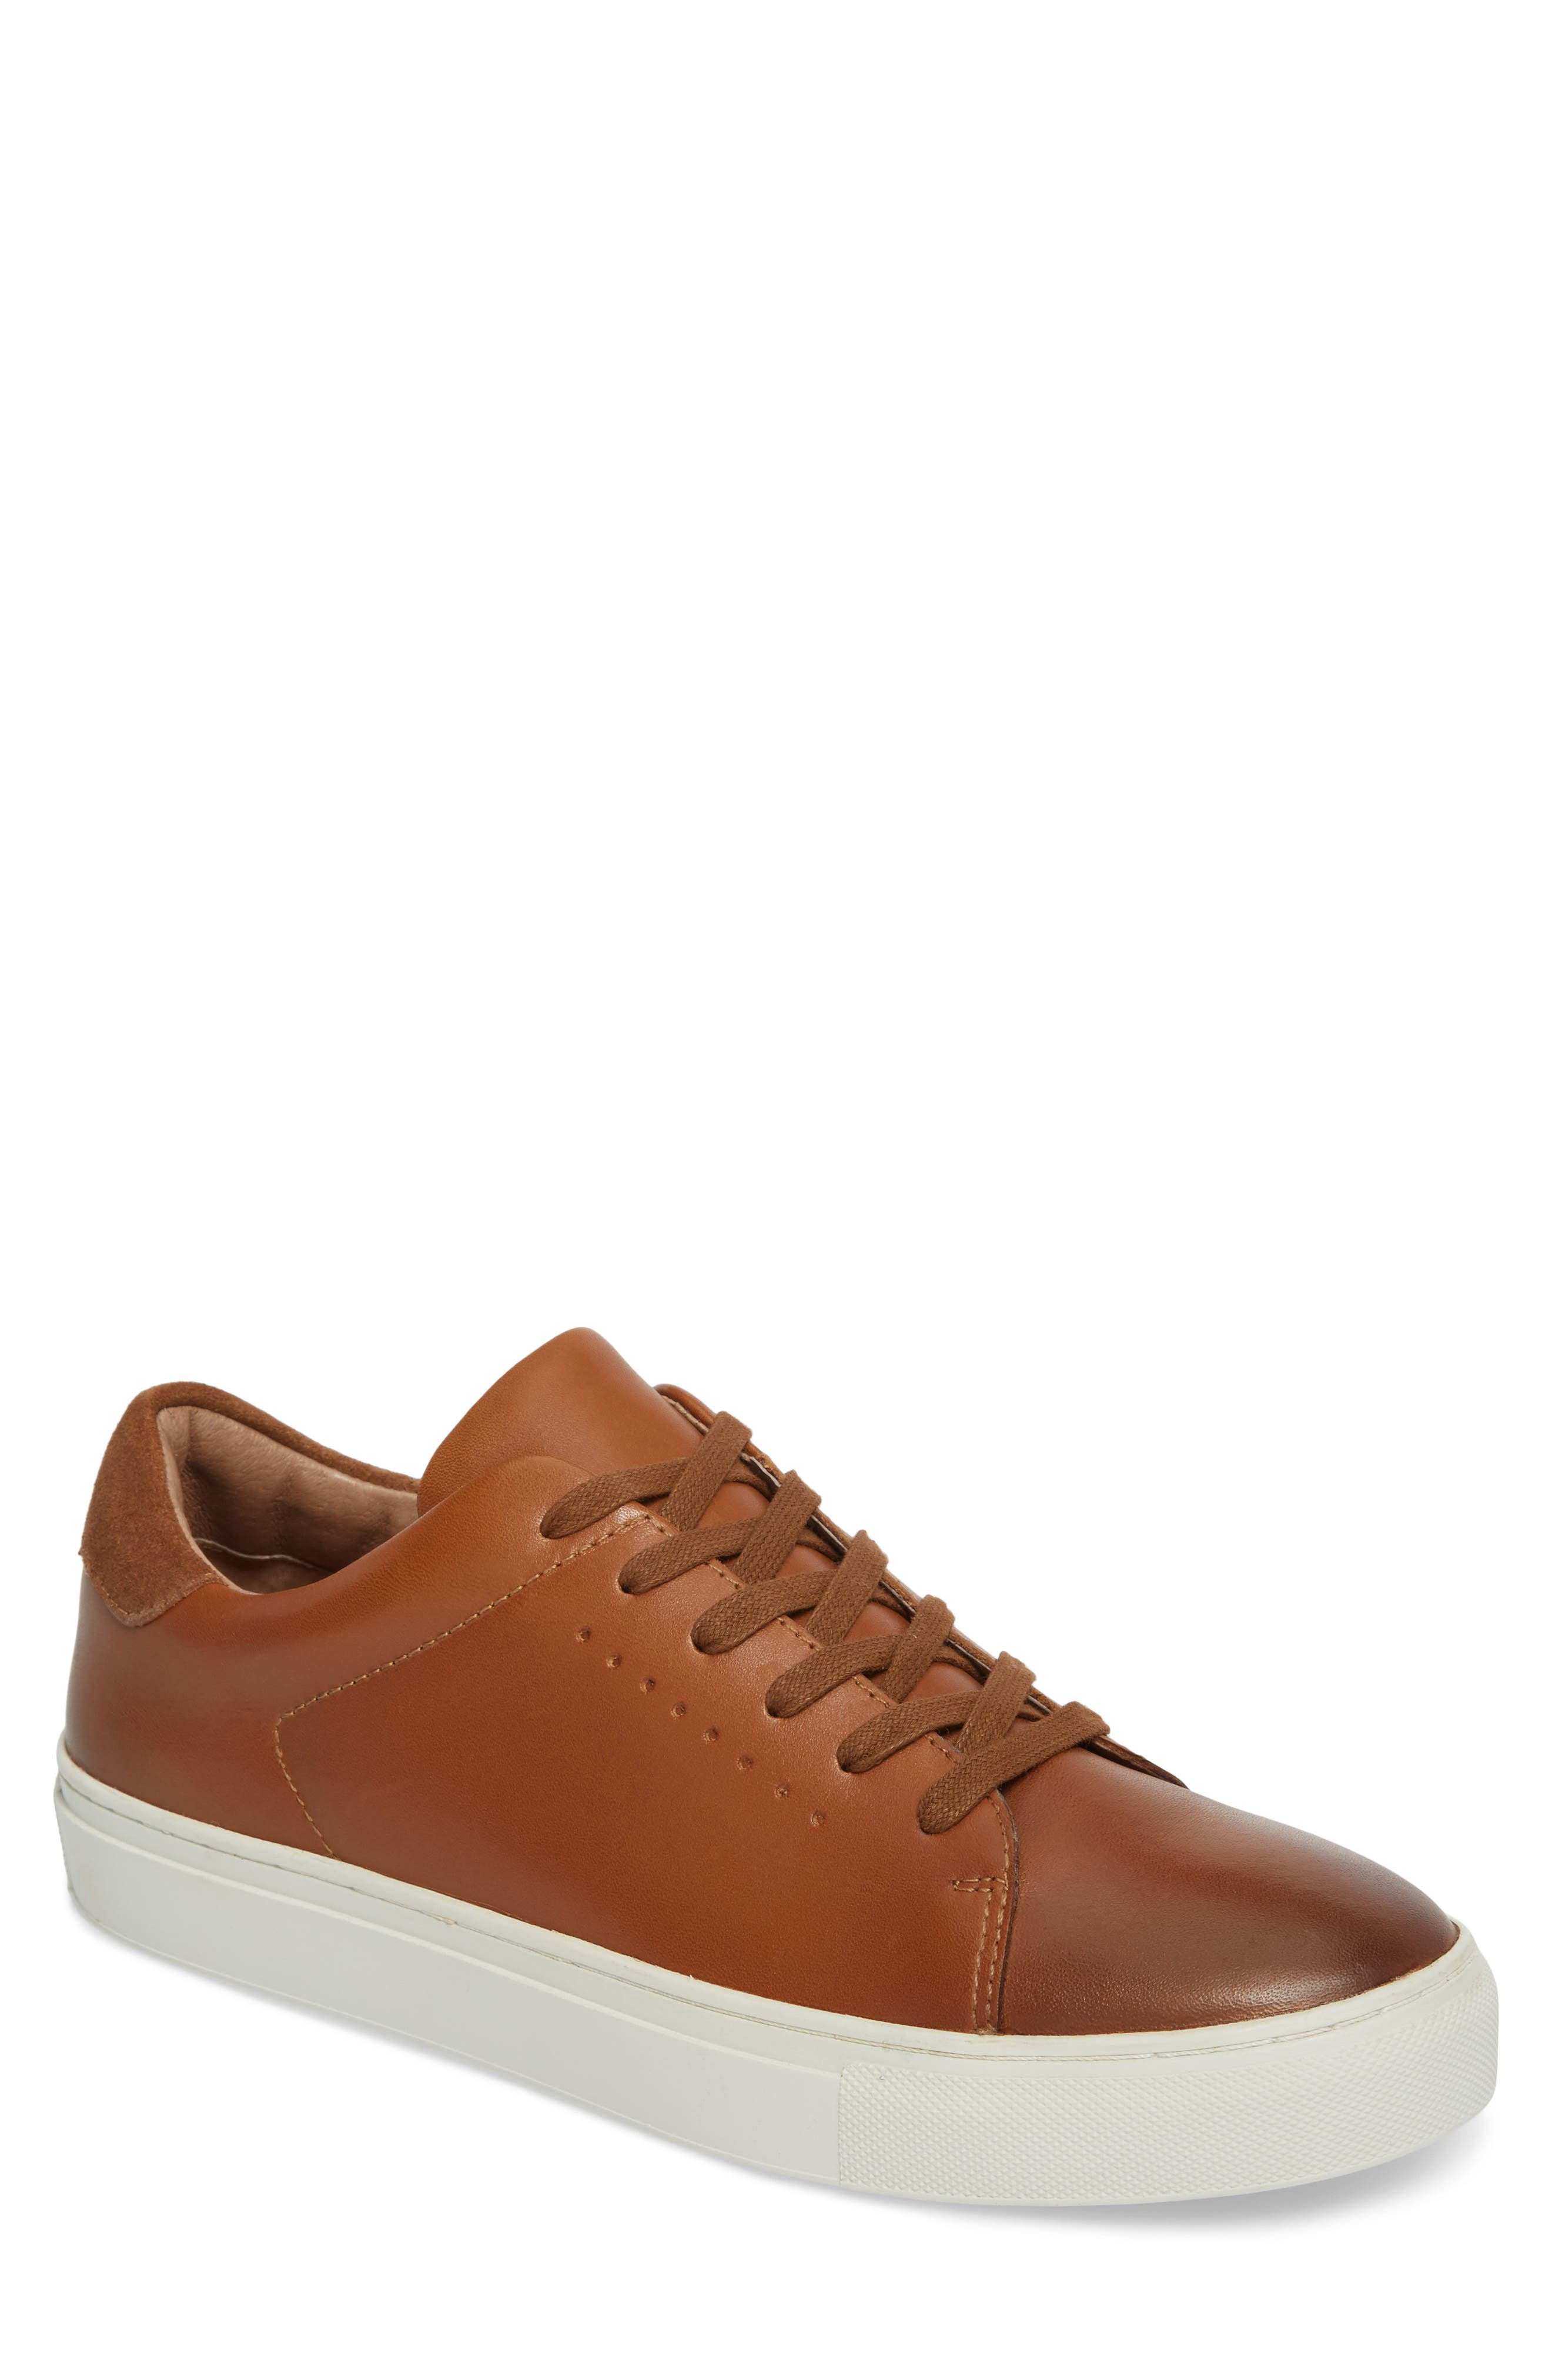 Desmond Sneaker,                         Main,                         color, Tan Leather